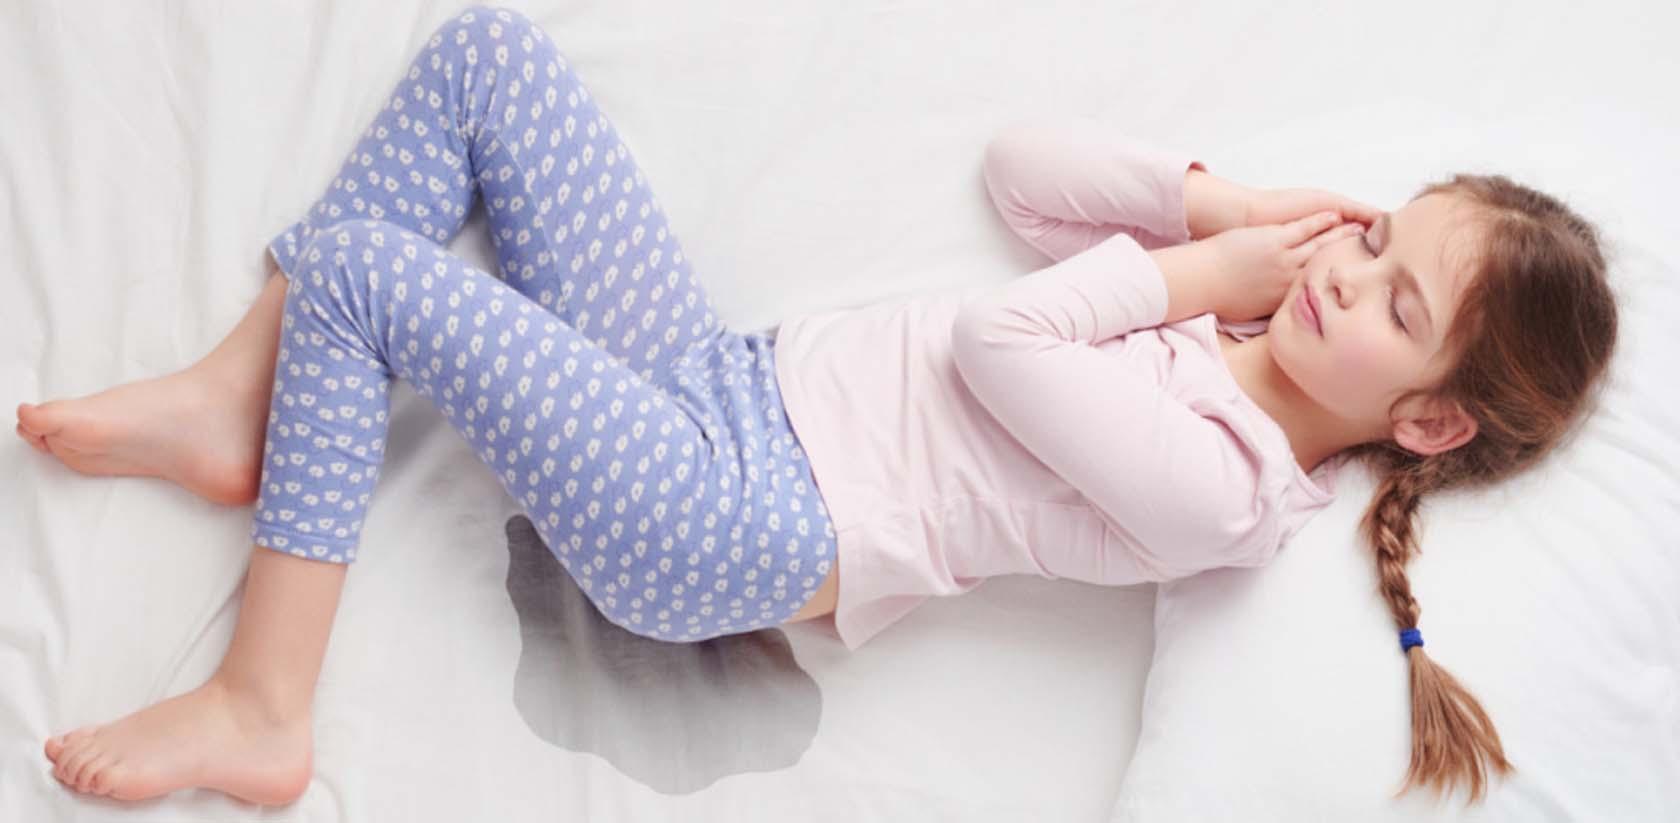 Bedwetting Habits In Kids